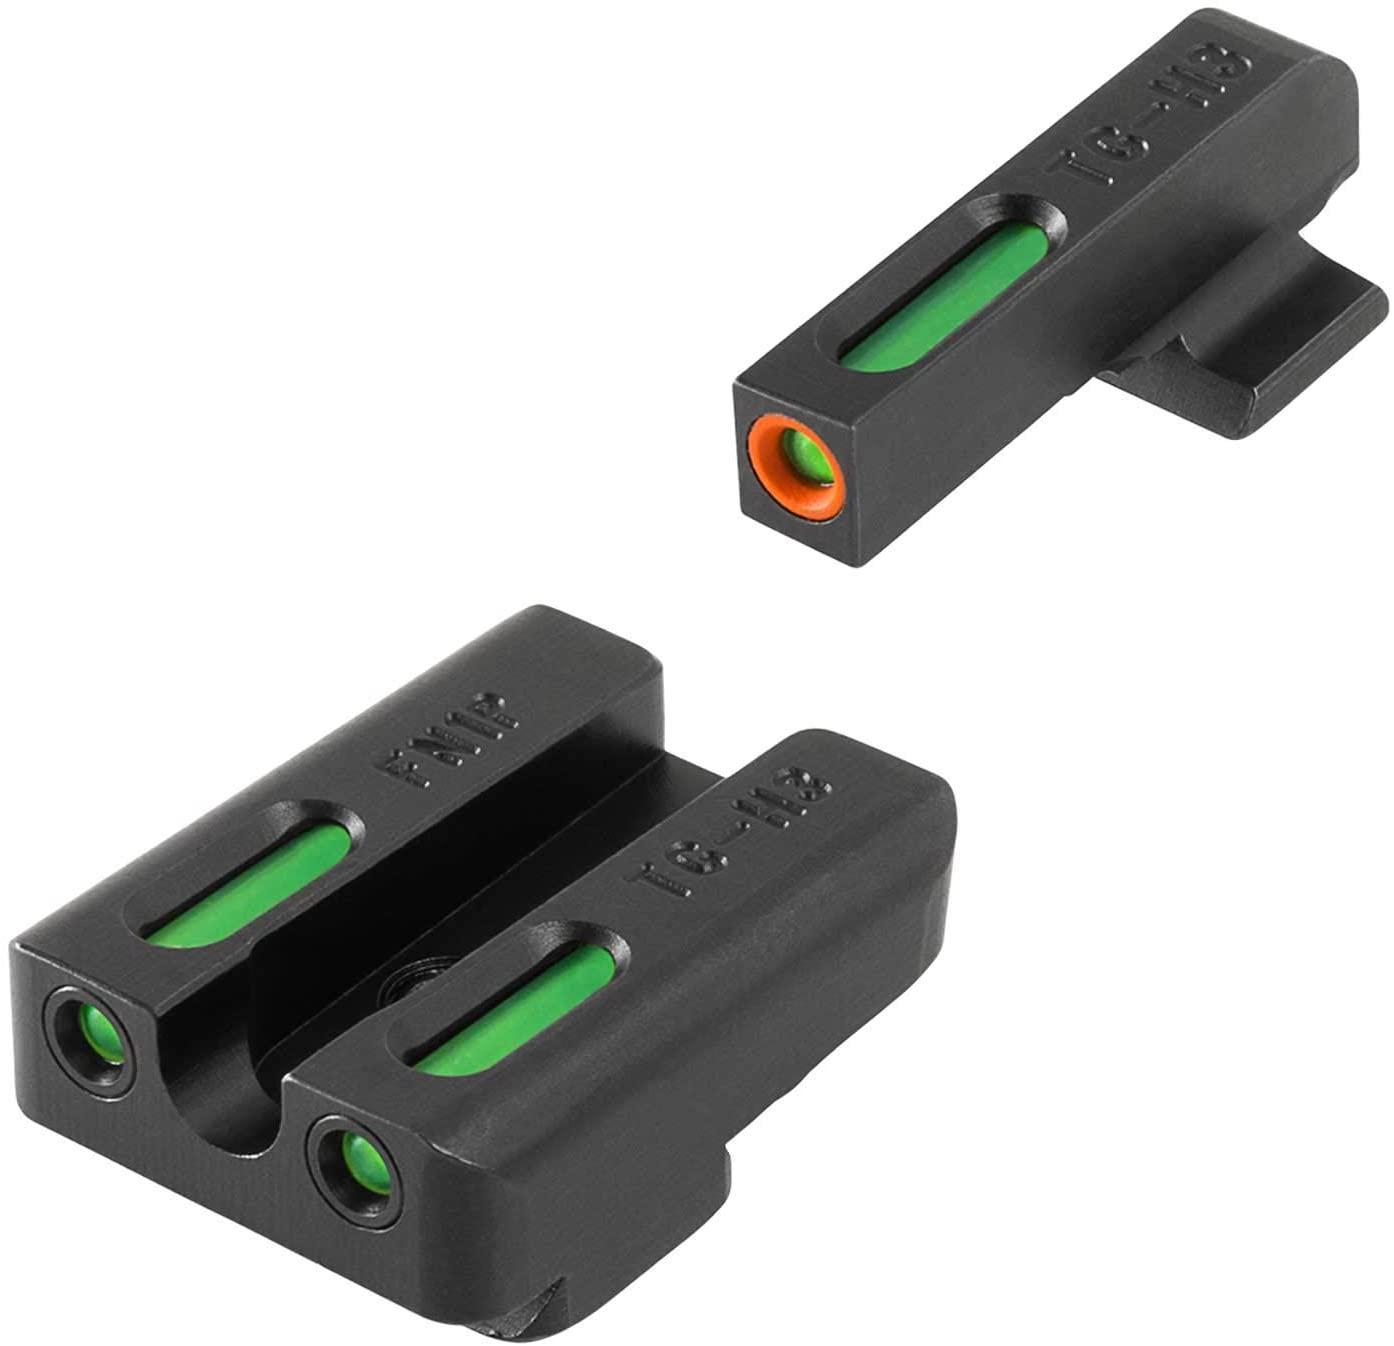 TRUGLO TFX Pro Tritium and Fiber Optic Xtreme Hangun Sights for FN Pistols